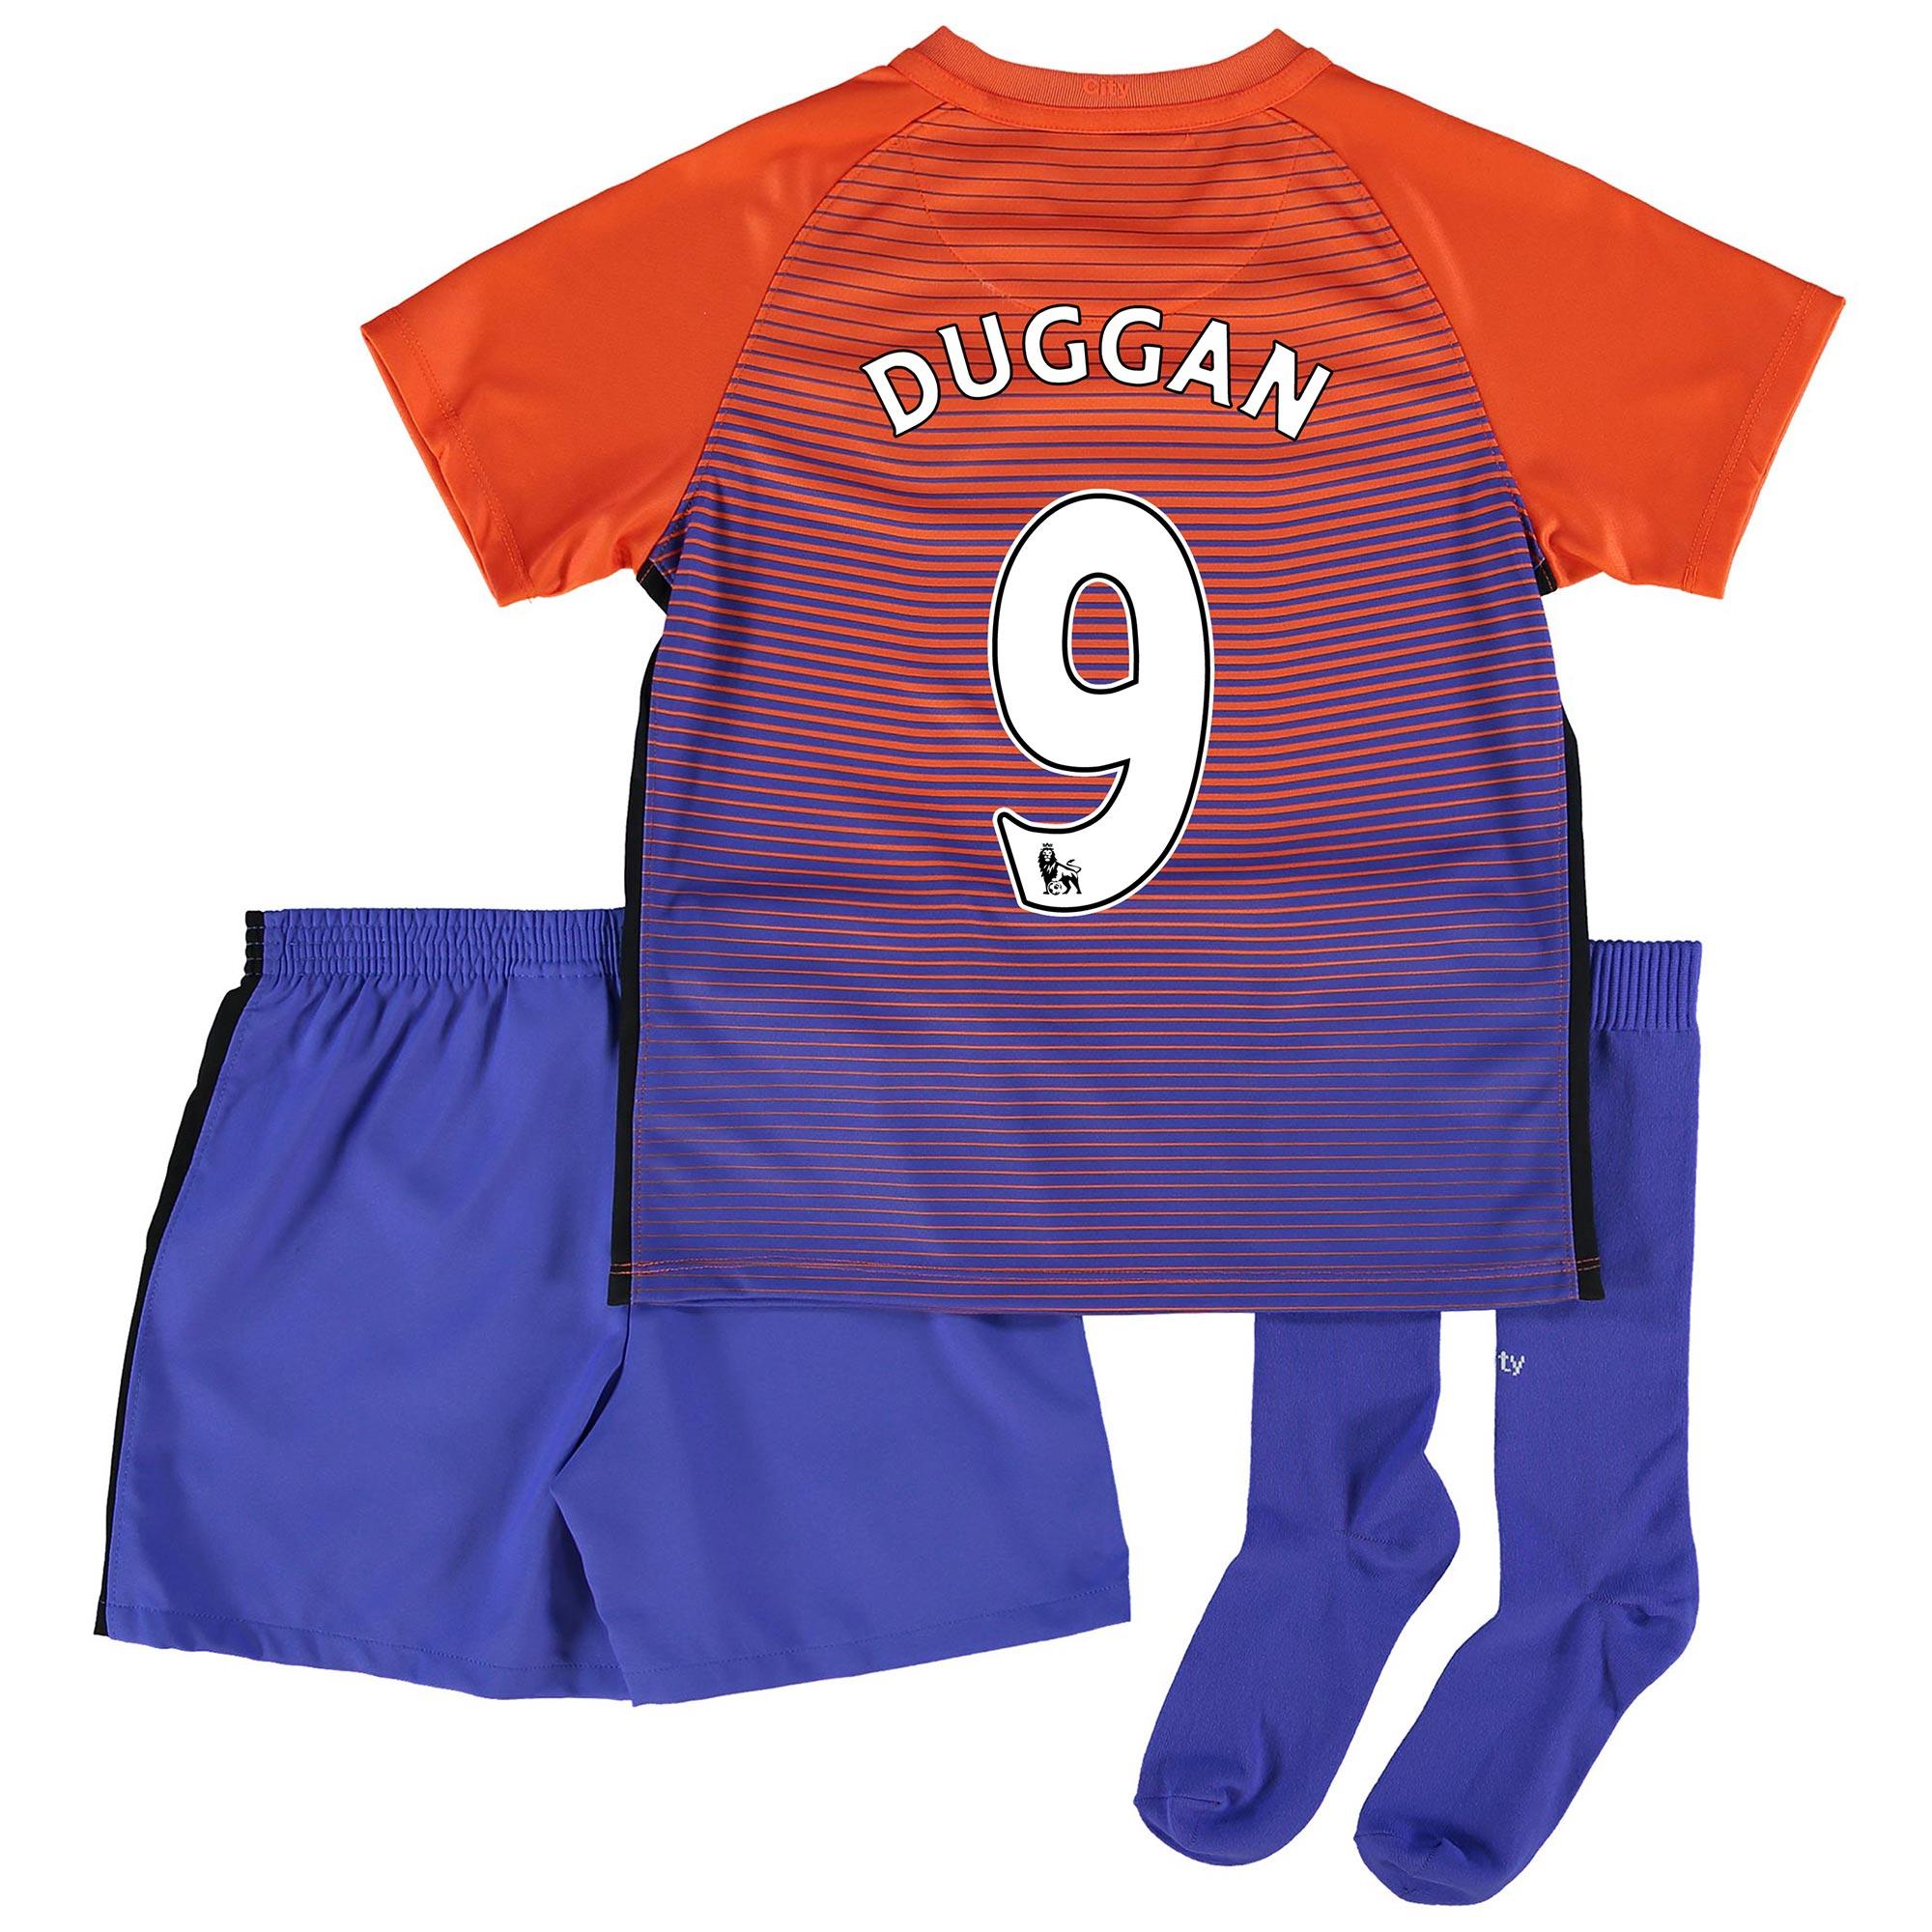 Manchester City Third Stadium Kit 2016-17 - Little Kids with Duggan 9